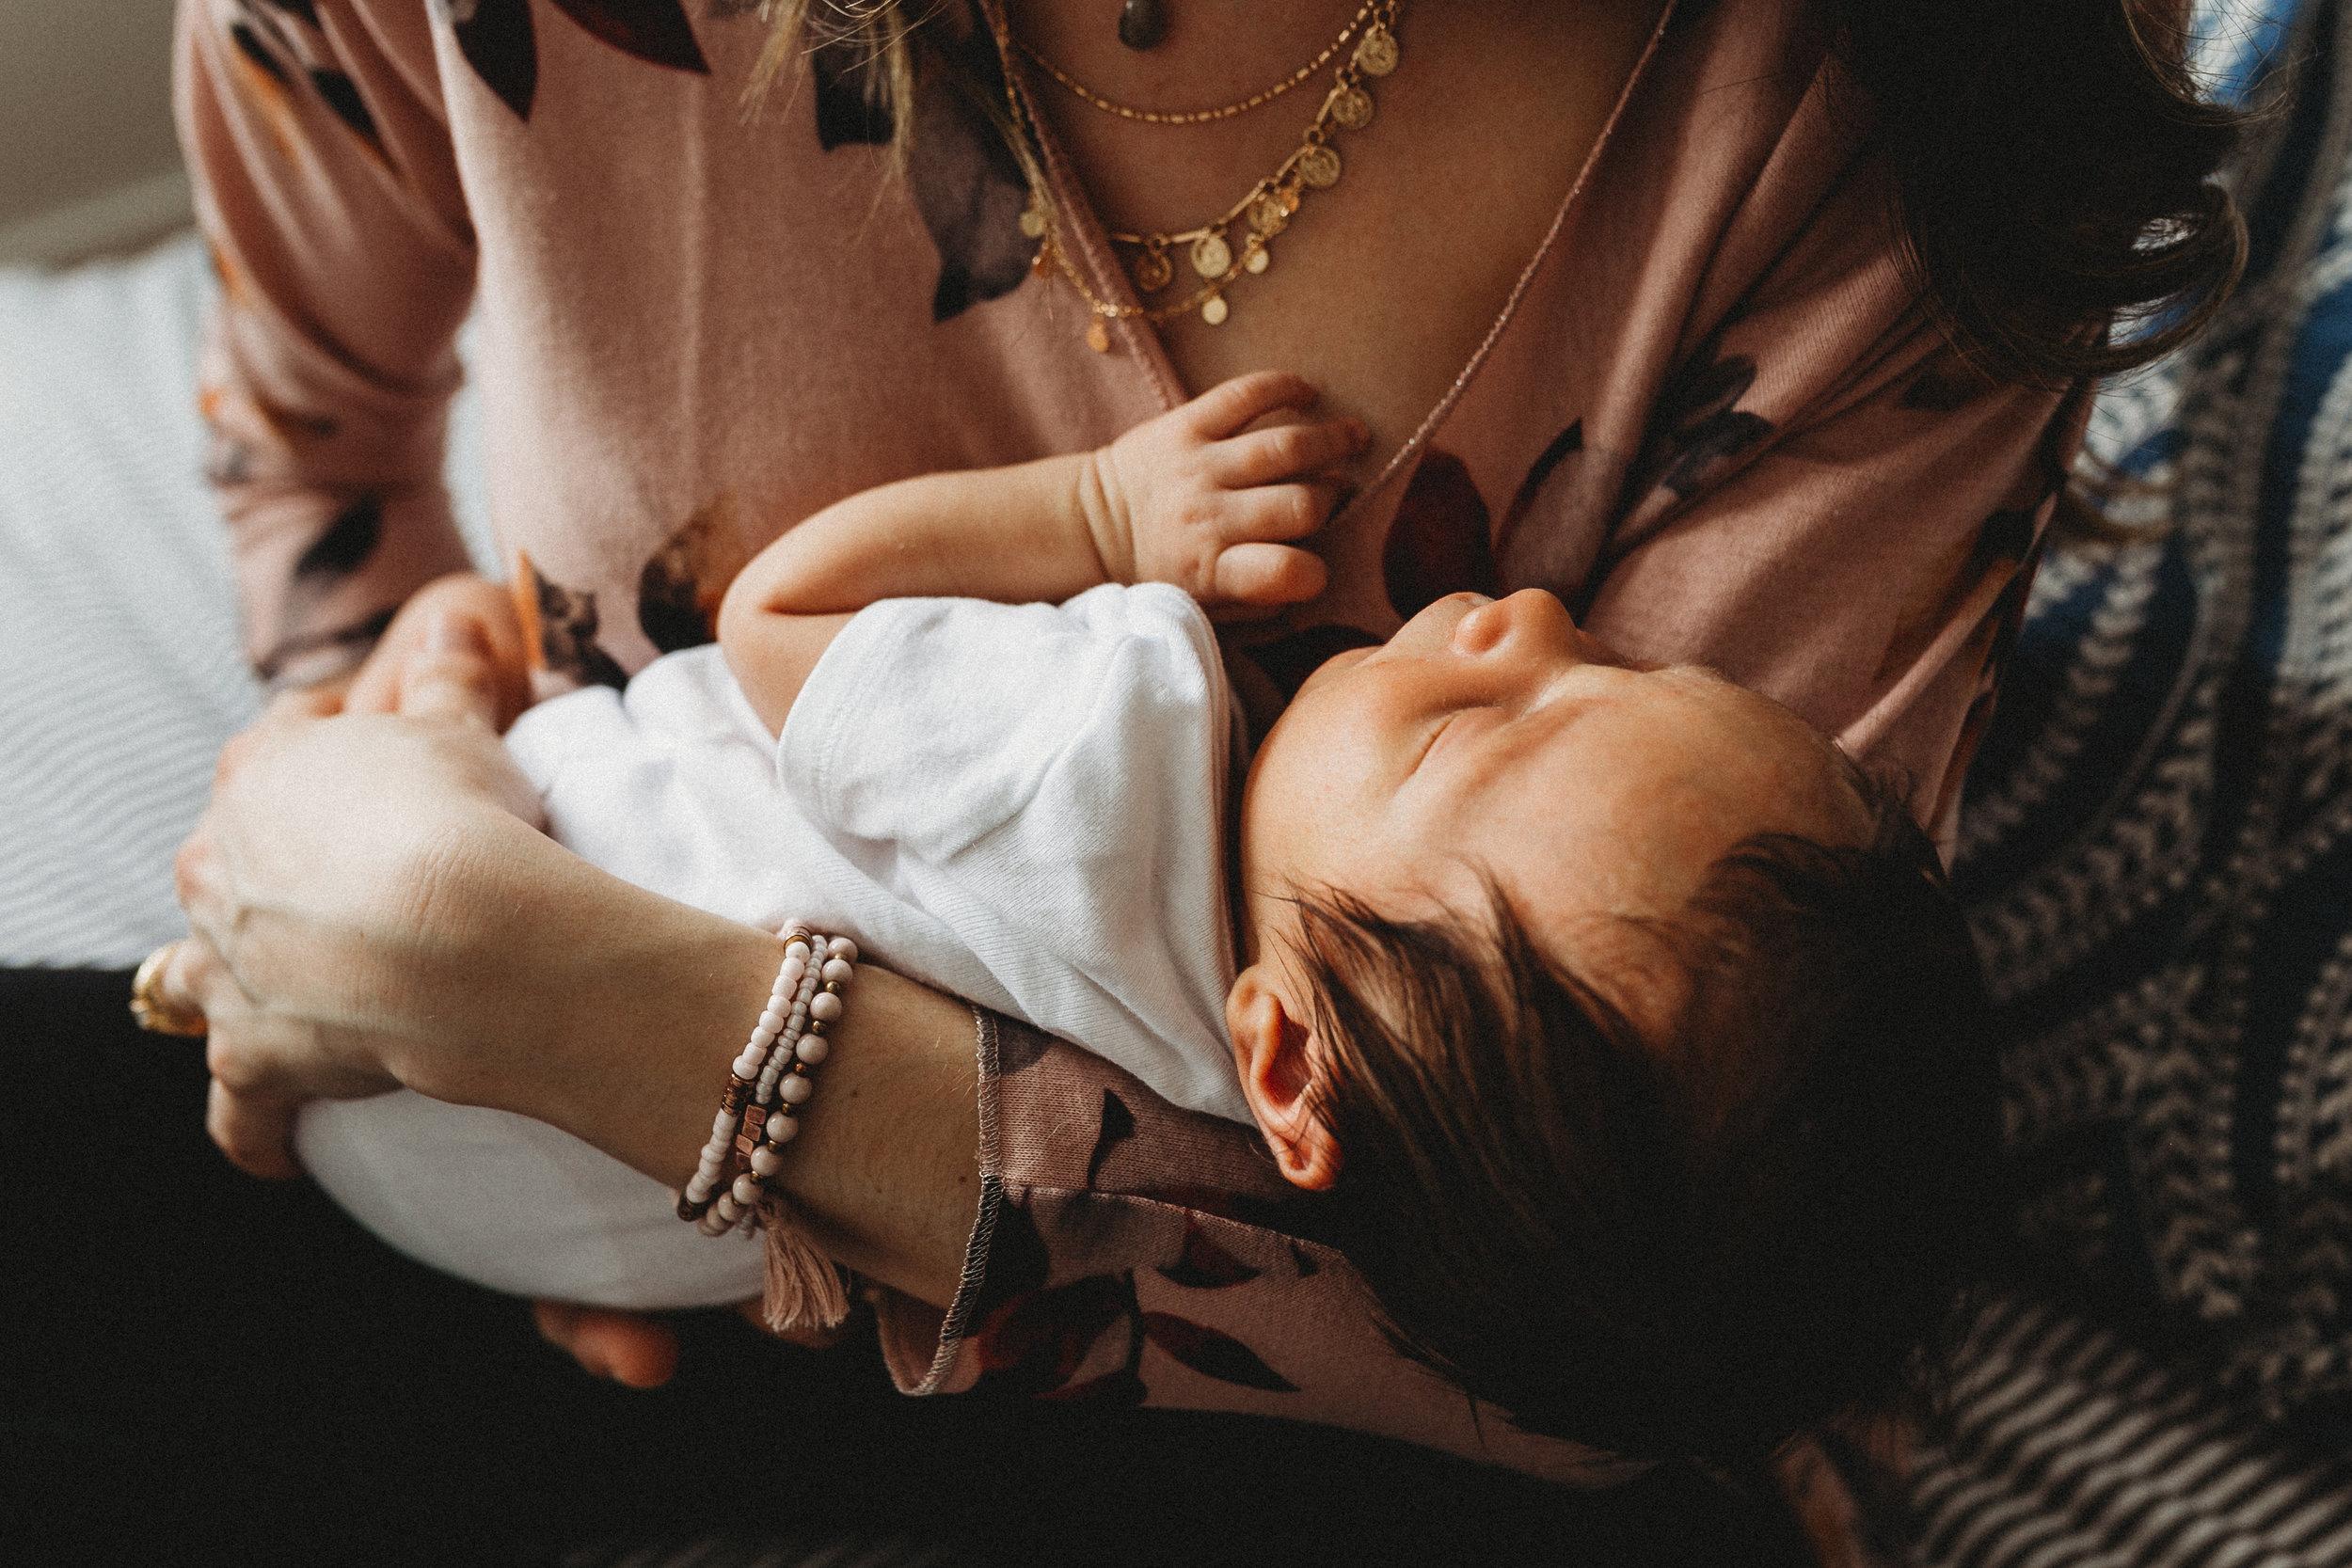 Baby_Roman-68.jpg